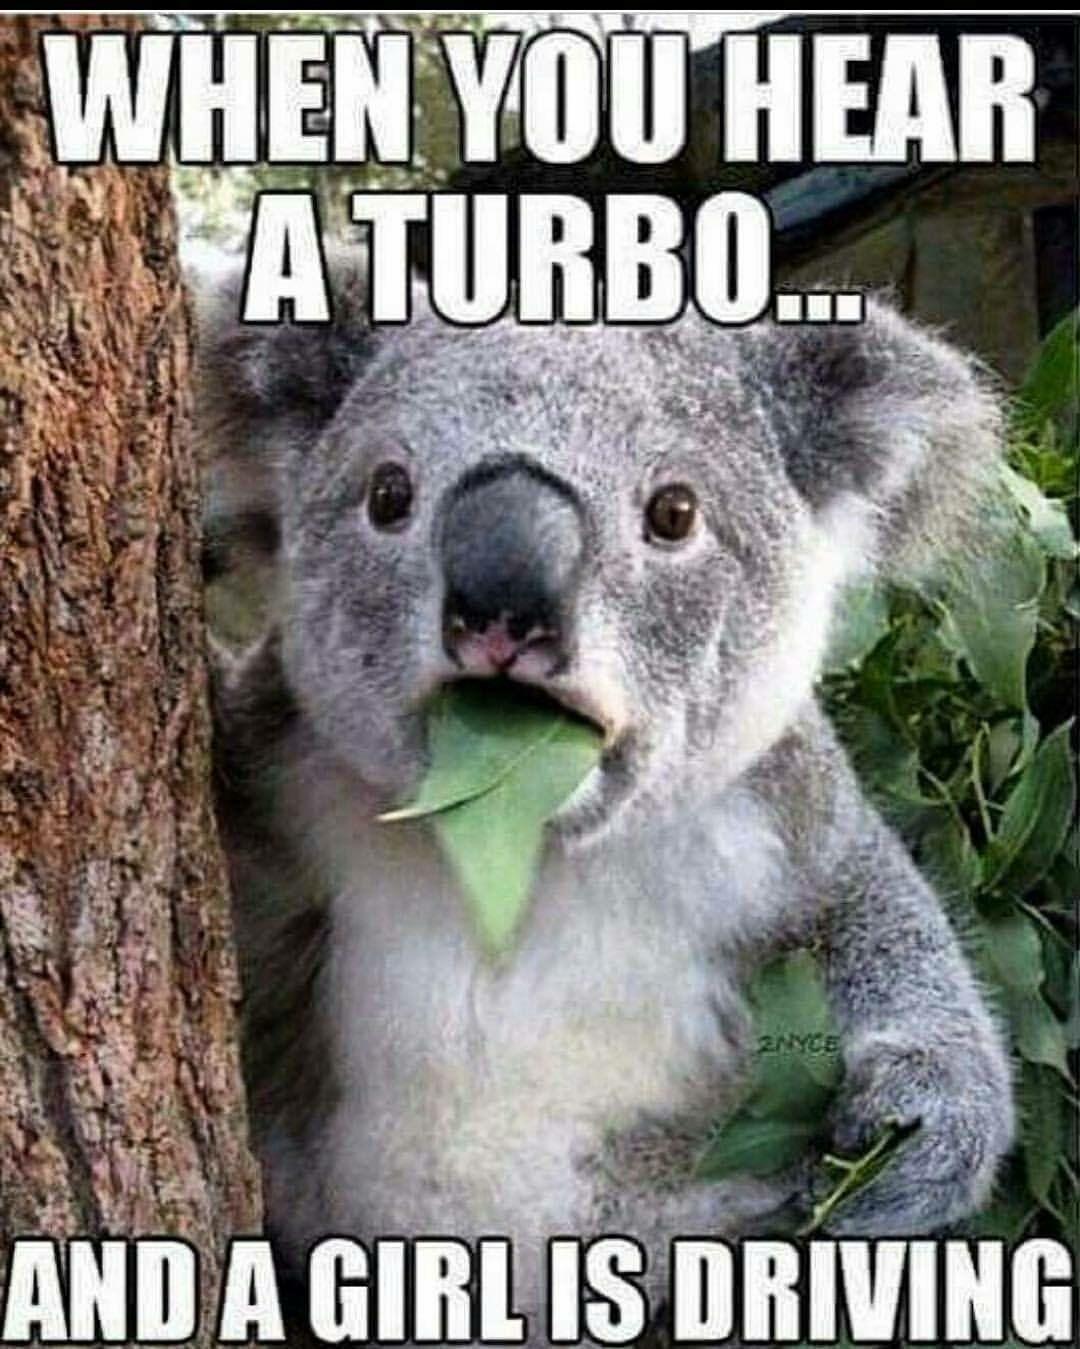 Pin by Crystal Newman on Car Memes | Funny koala, Funny ...  Funny Koala Memes